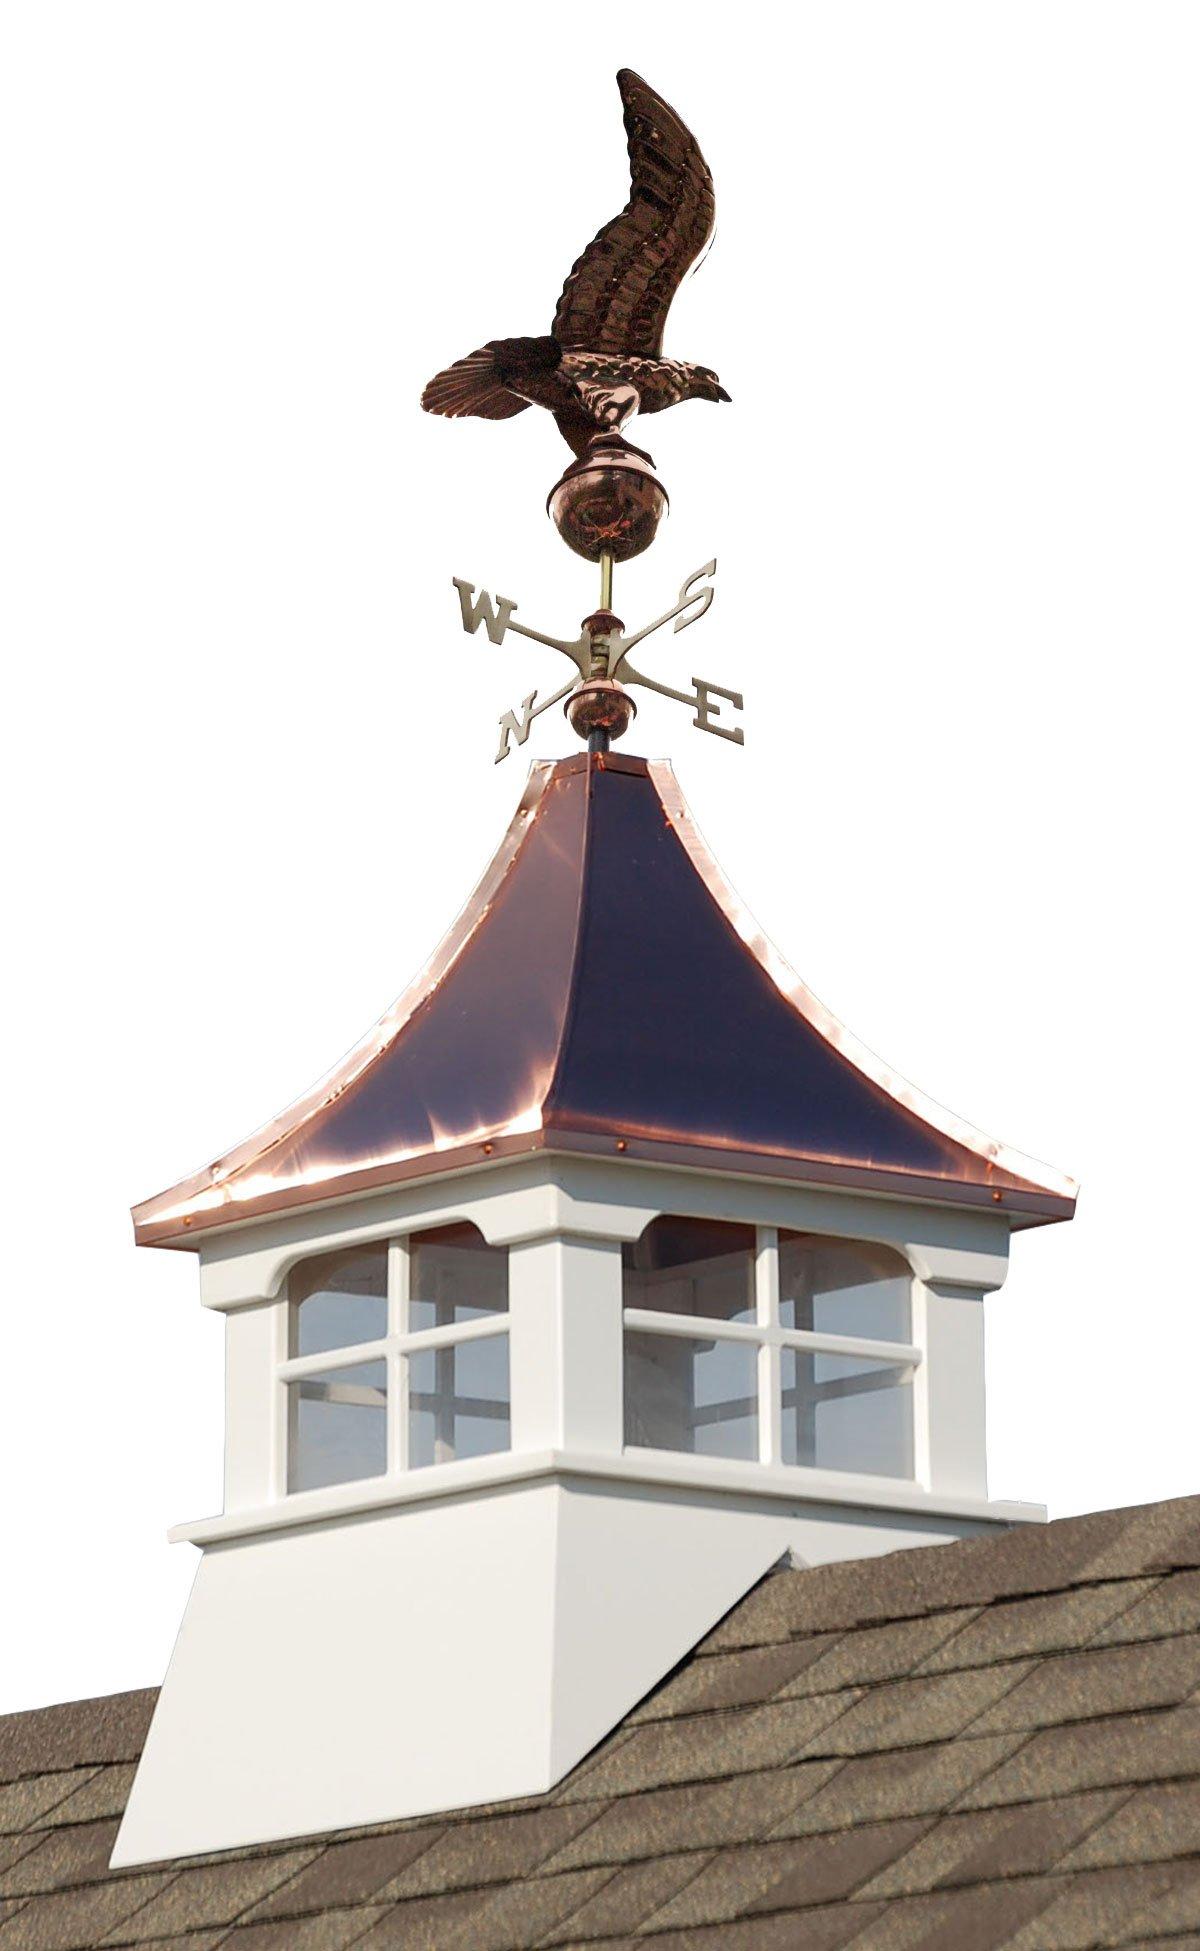 Accentua Charleston Cupola with Eagle Weathervane